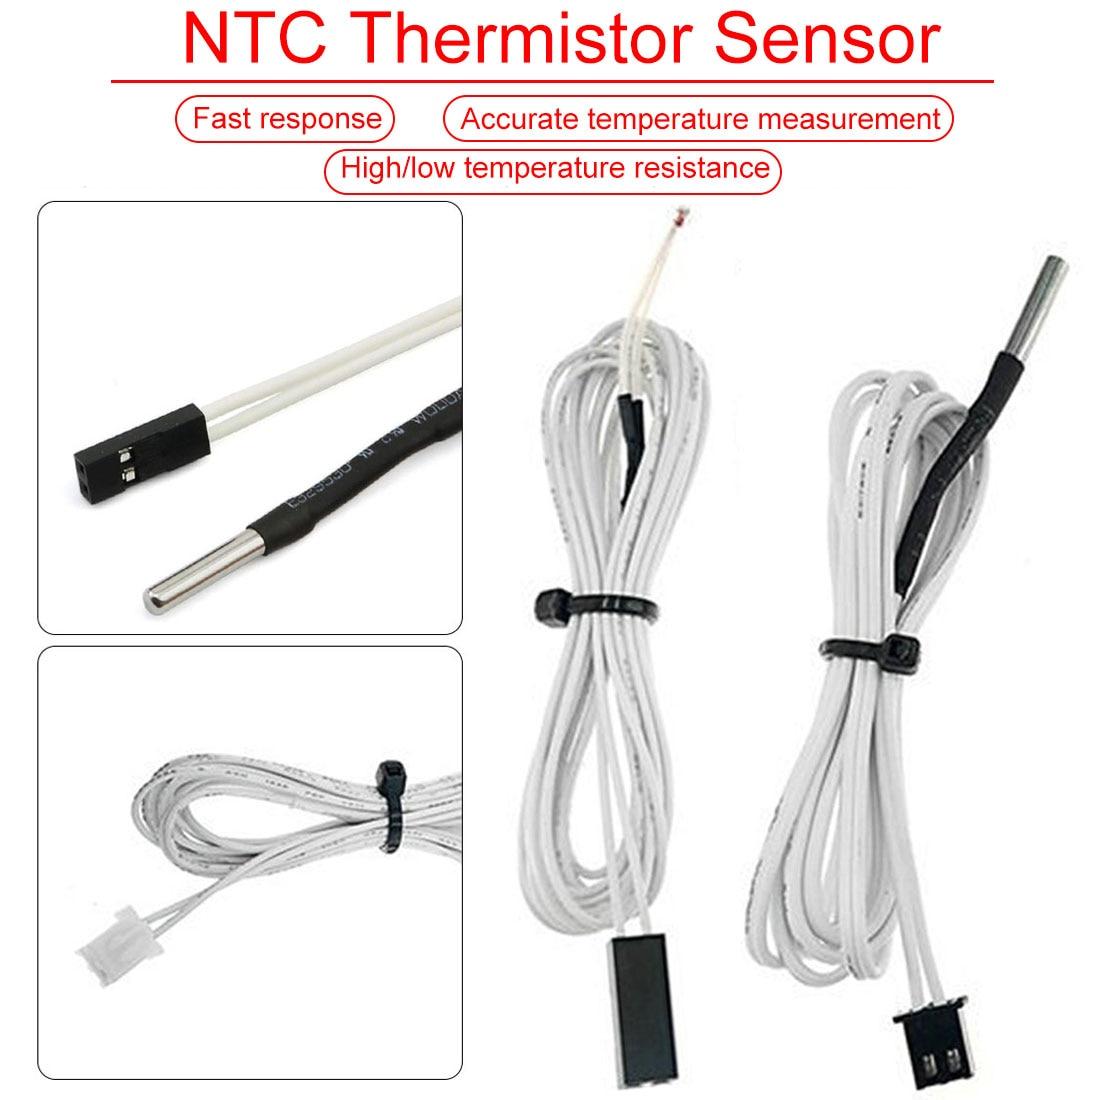 1M/2M HT-NTC100K Thermistor Temperature Sensor For High Temperature Filament 350 Degrees Hotend Kit For 3D Printer Parts